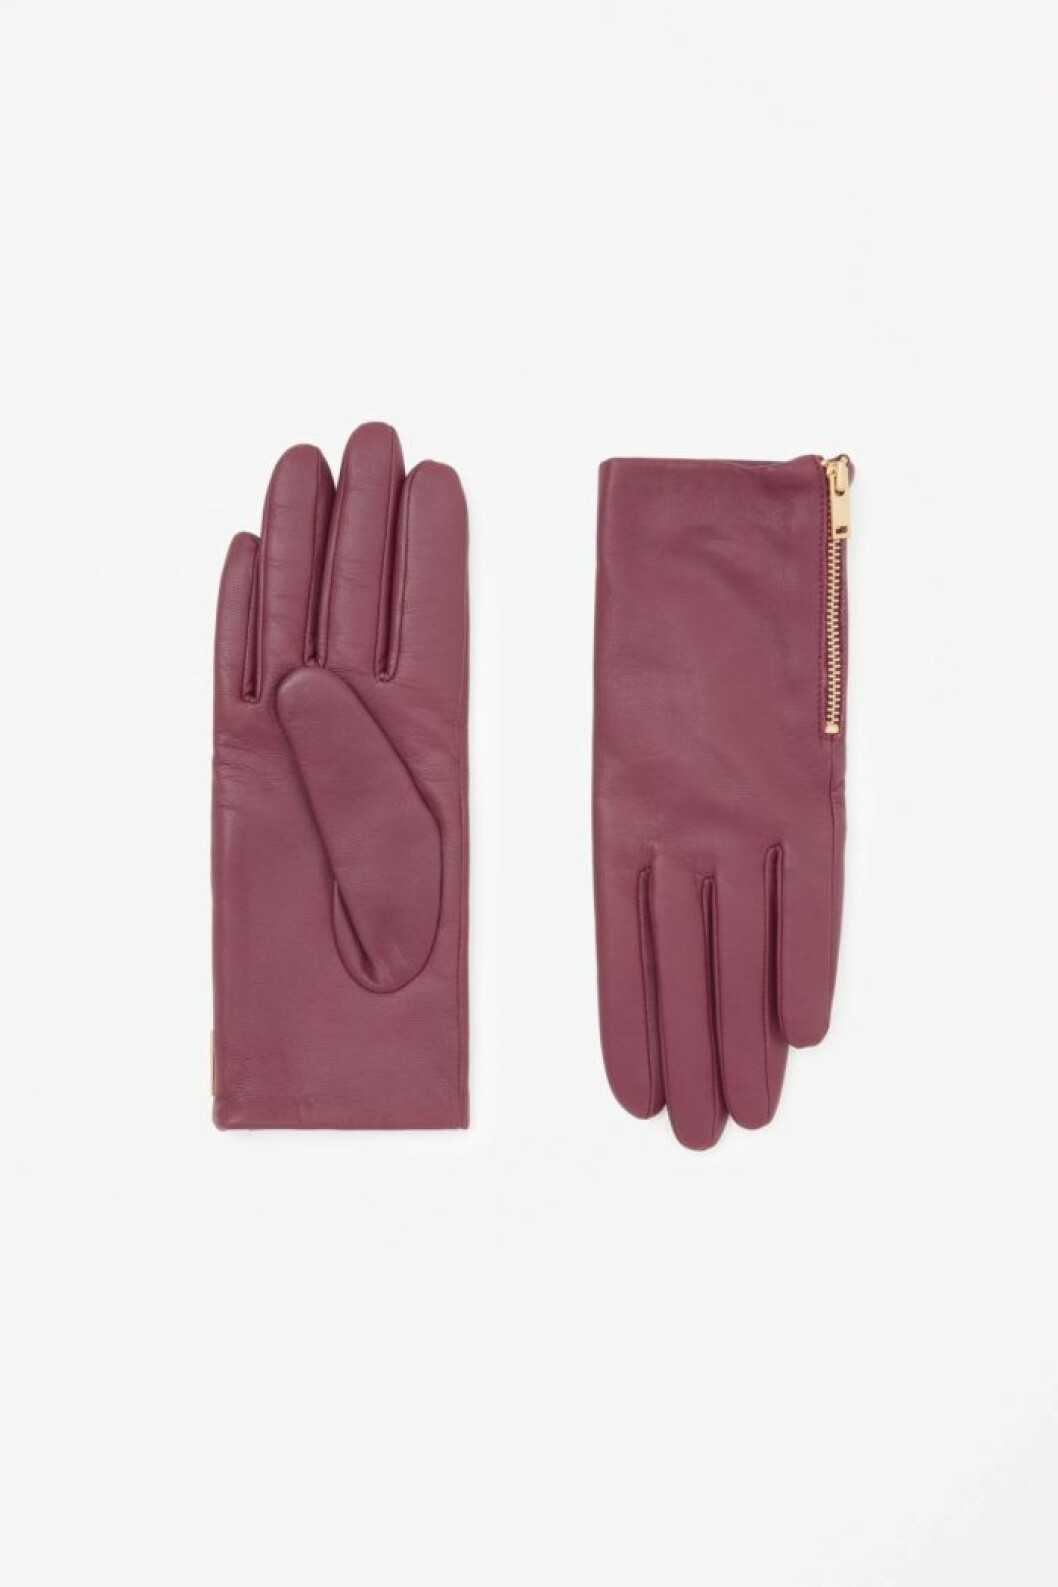 skinn-handskar-cos